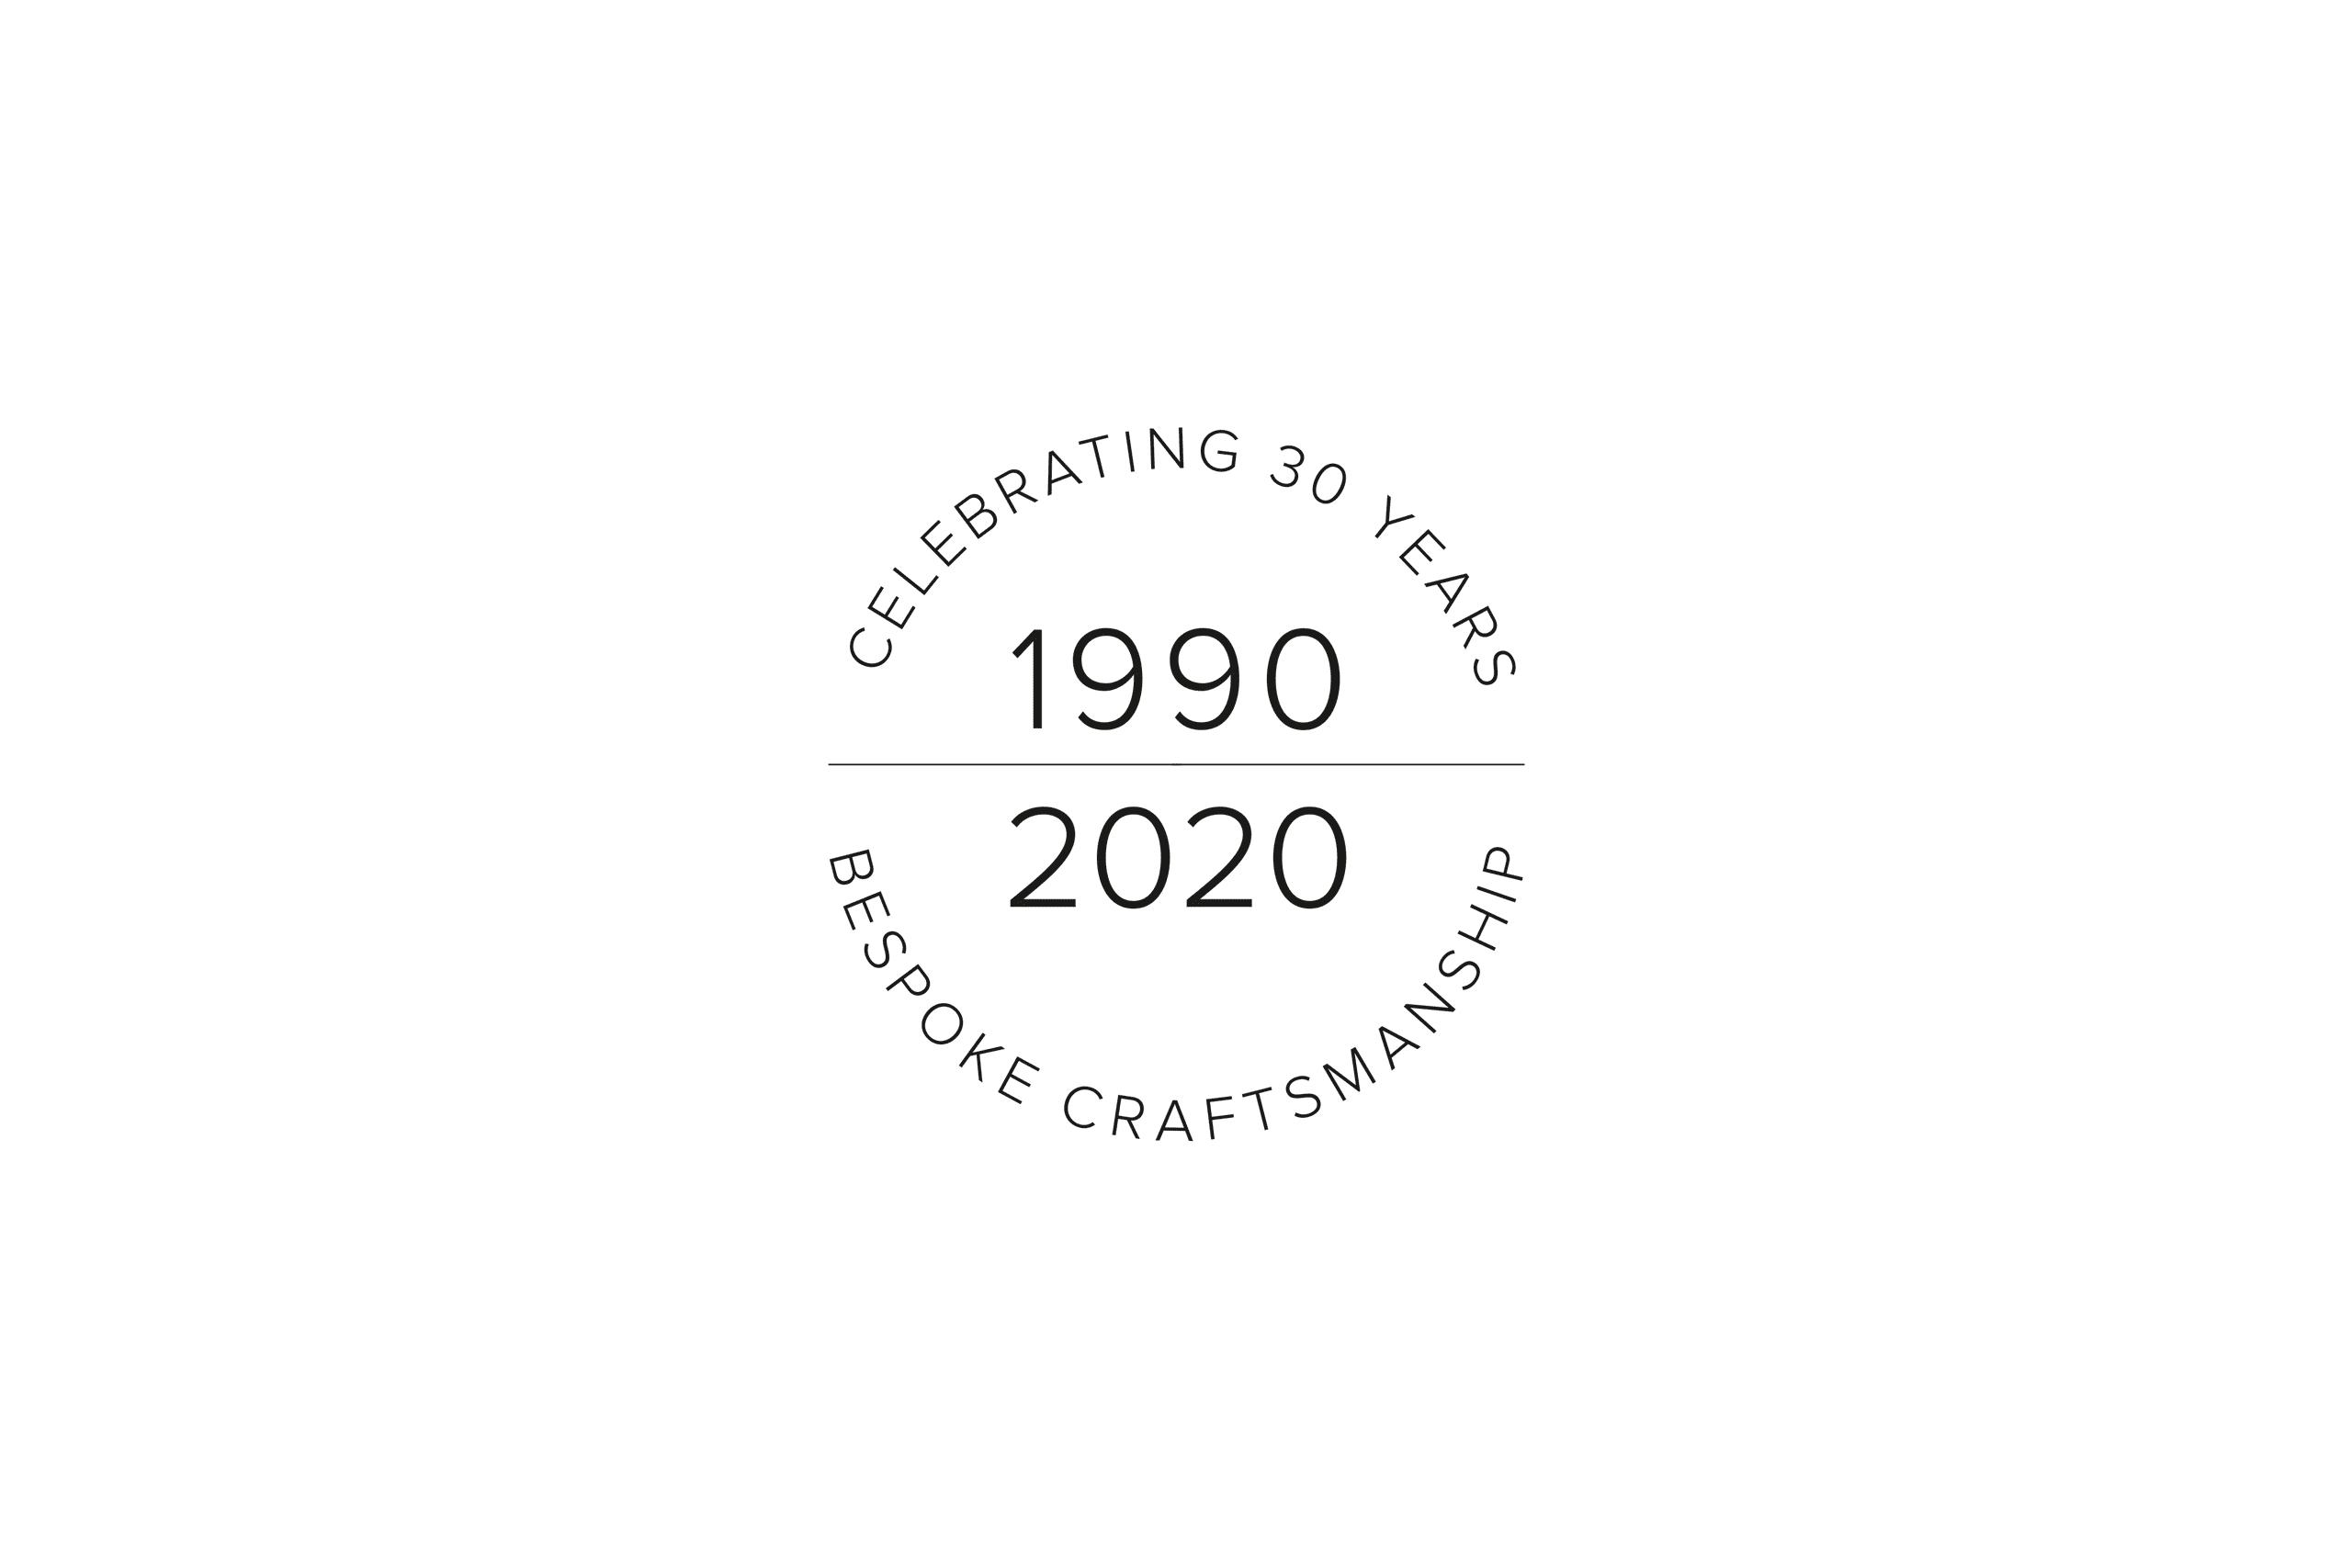 Bath Kitchen Company anniversary logo 2020